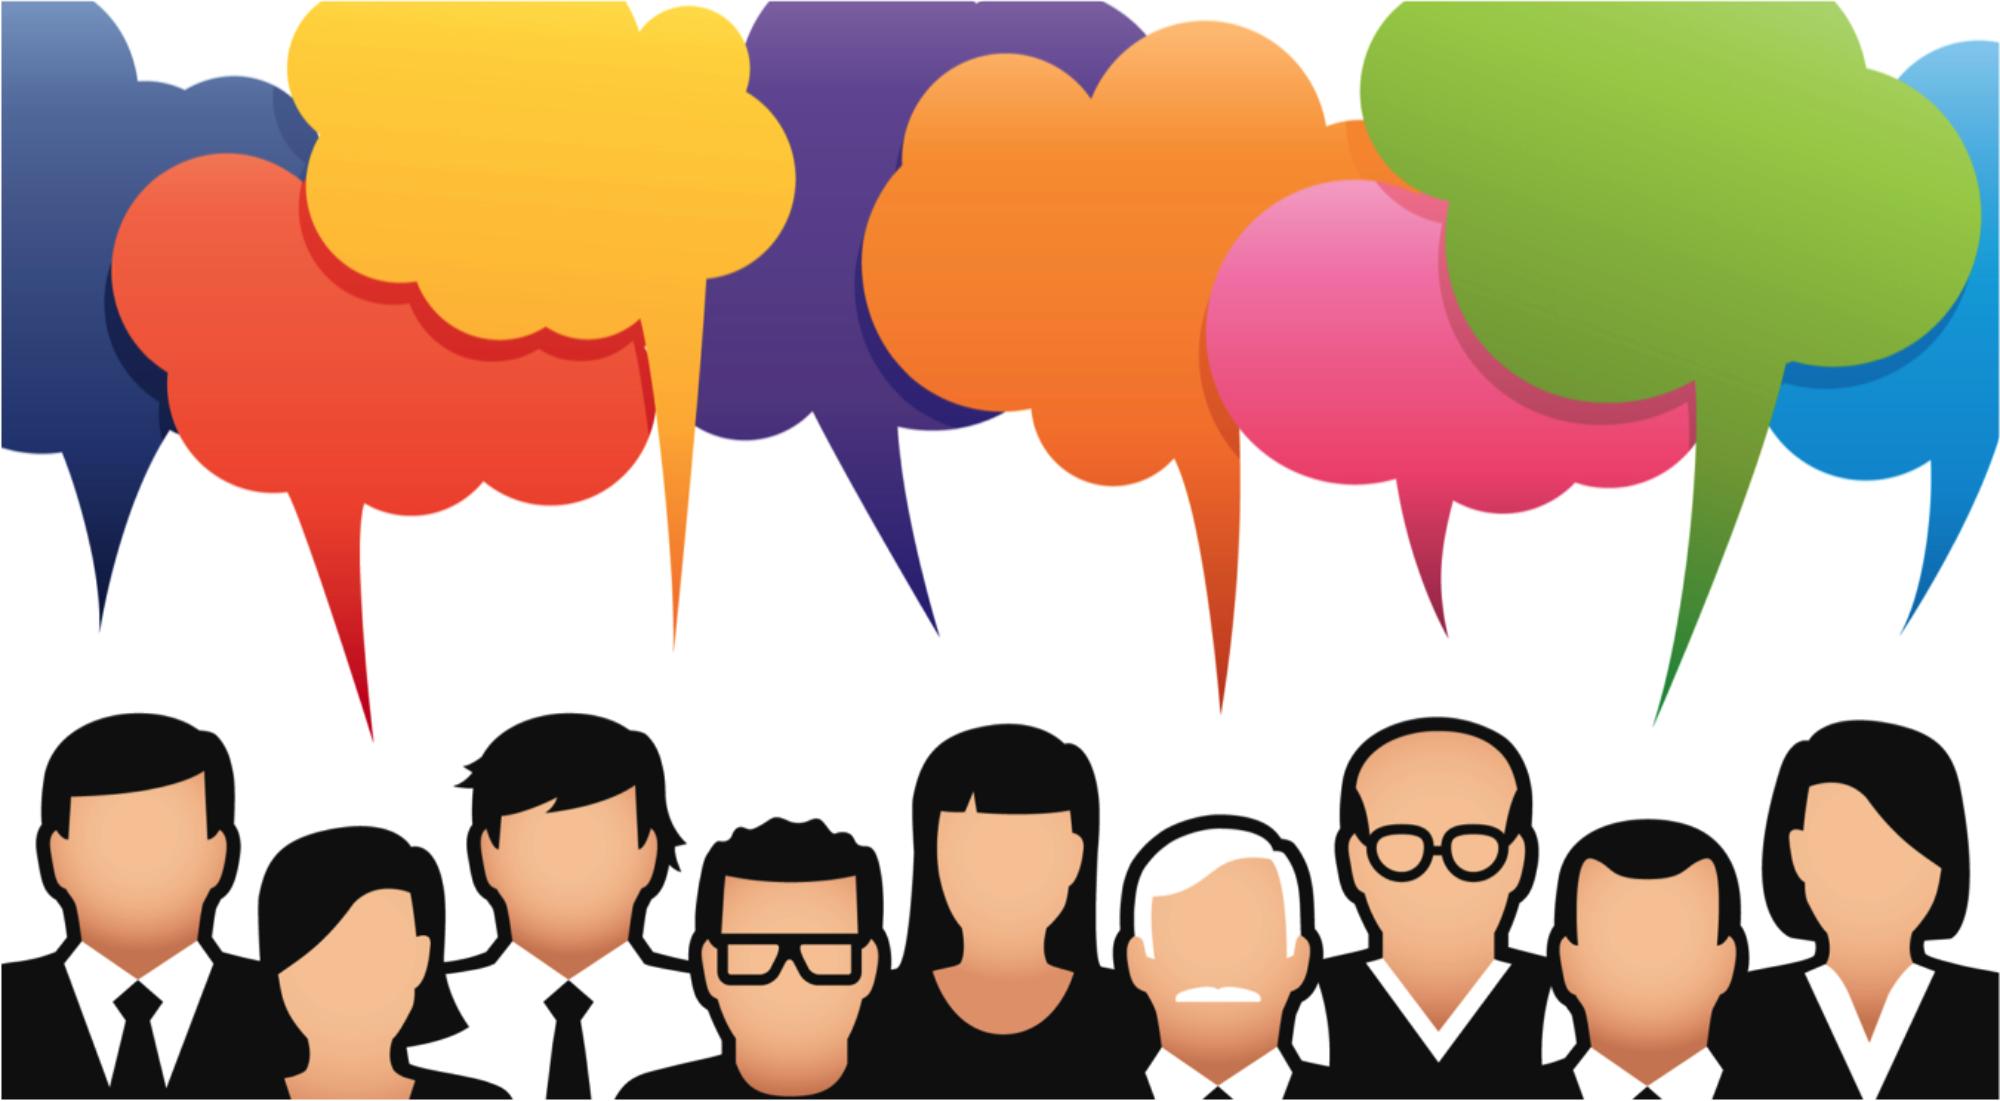 2000x1101 B2the7 Bits Your Communication Strategy Ecrm Communication